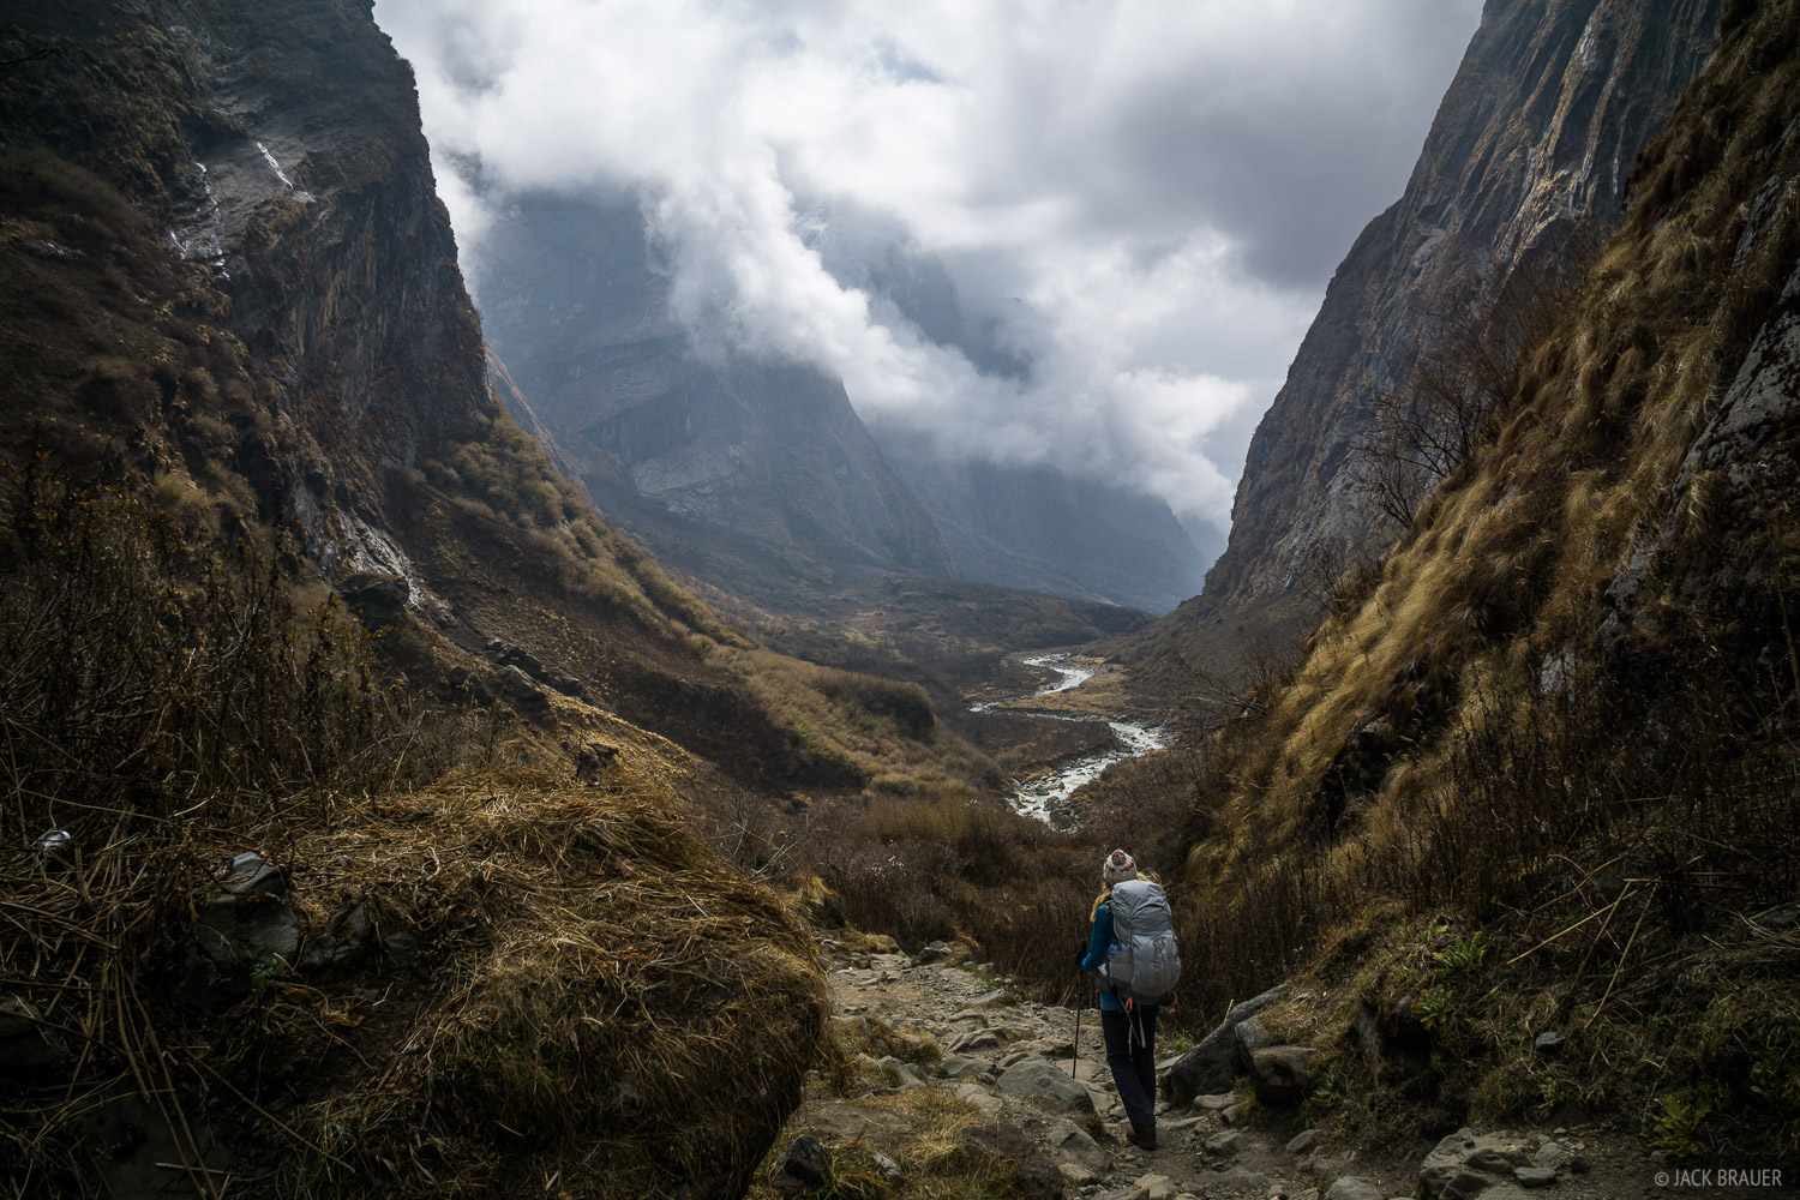 Hiking down the vertical gorge of the Modi Khola.